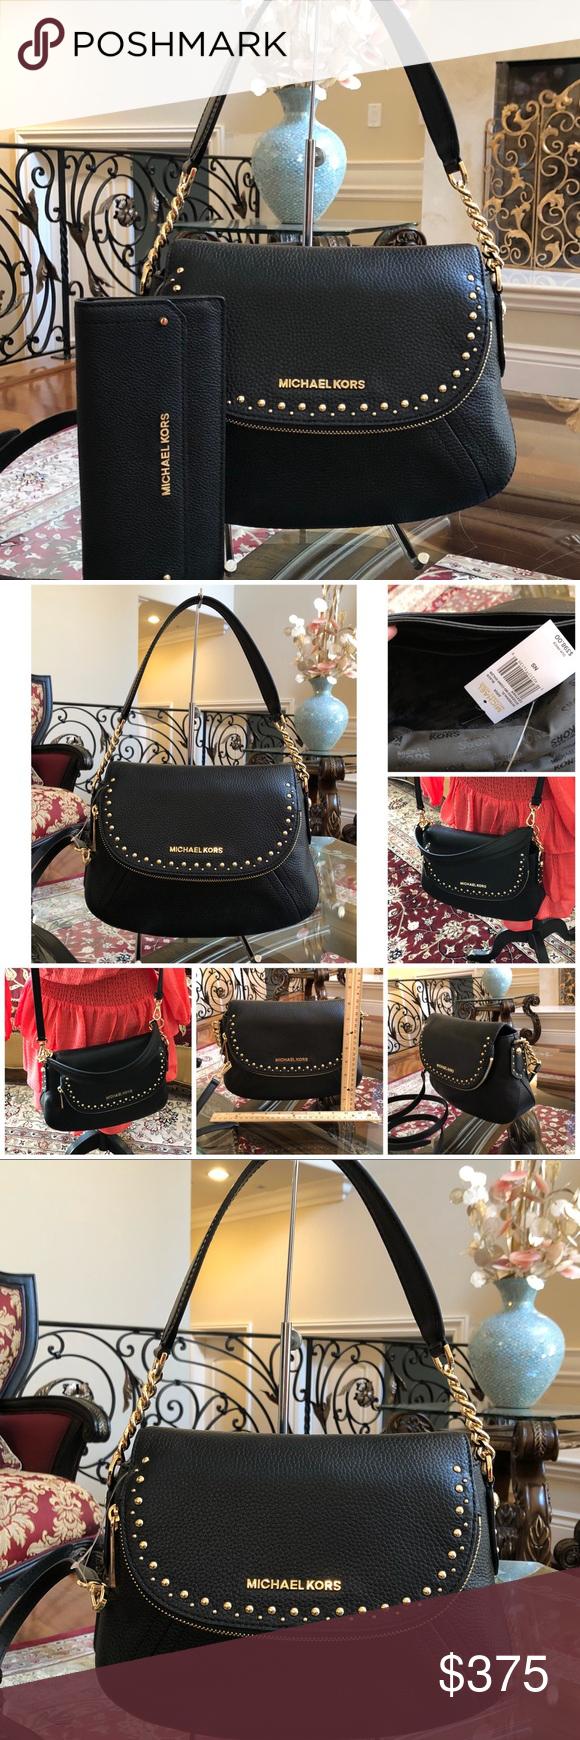 4a900e1043da Michael Kors Aria MD Conv handbag wallet set Guaranteed Authentic Bundled  2PCS Handbag+Wallet set NWT MICHAEL KORS STUDDED MD CONV SHOULDER STYLE  ...